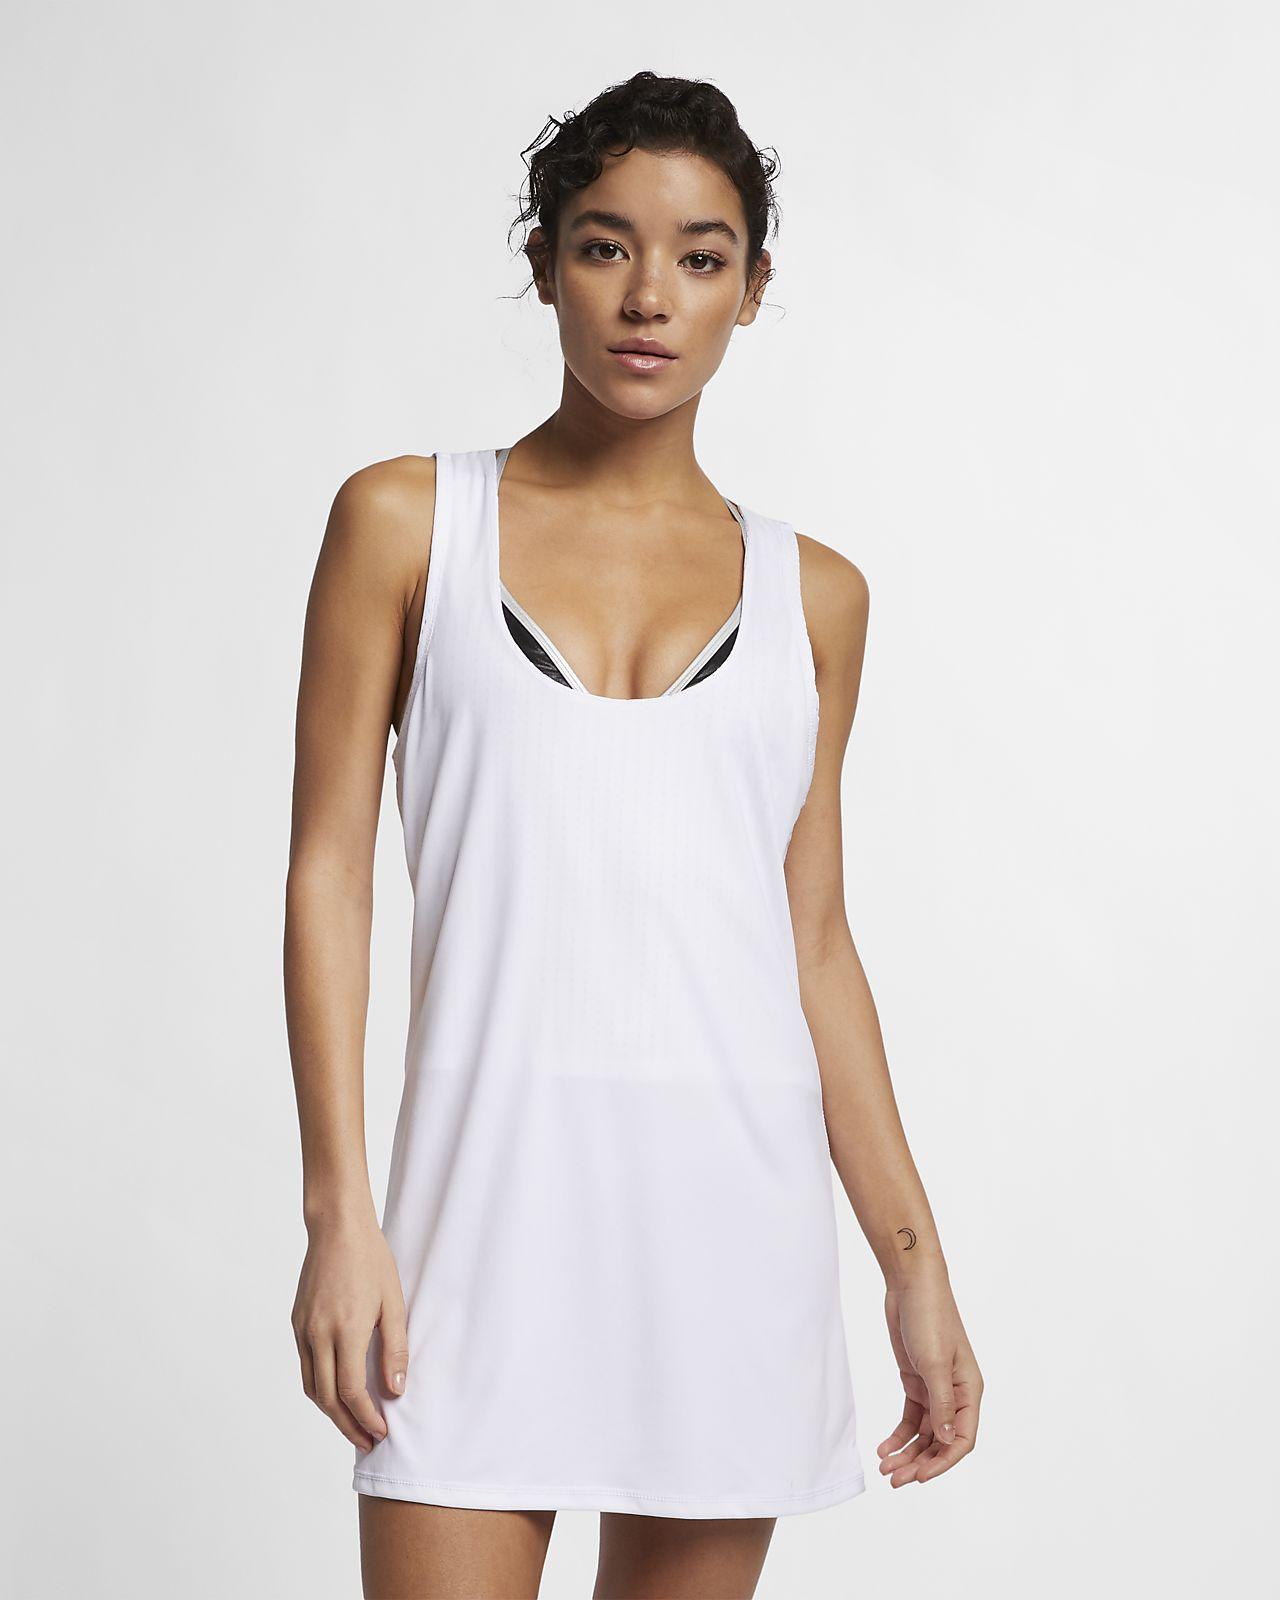 c4d993780fc91 Nike Sport Mesh Cover-Up Women's Reversible Layered Dress. Nike.com